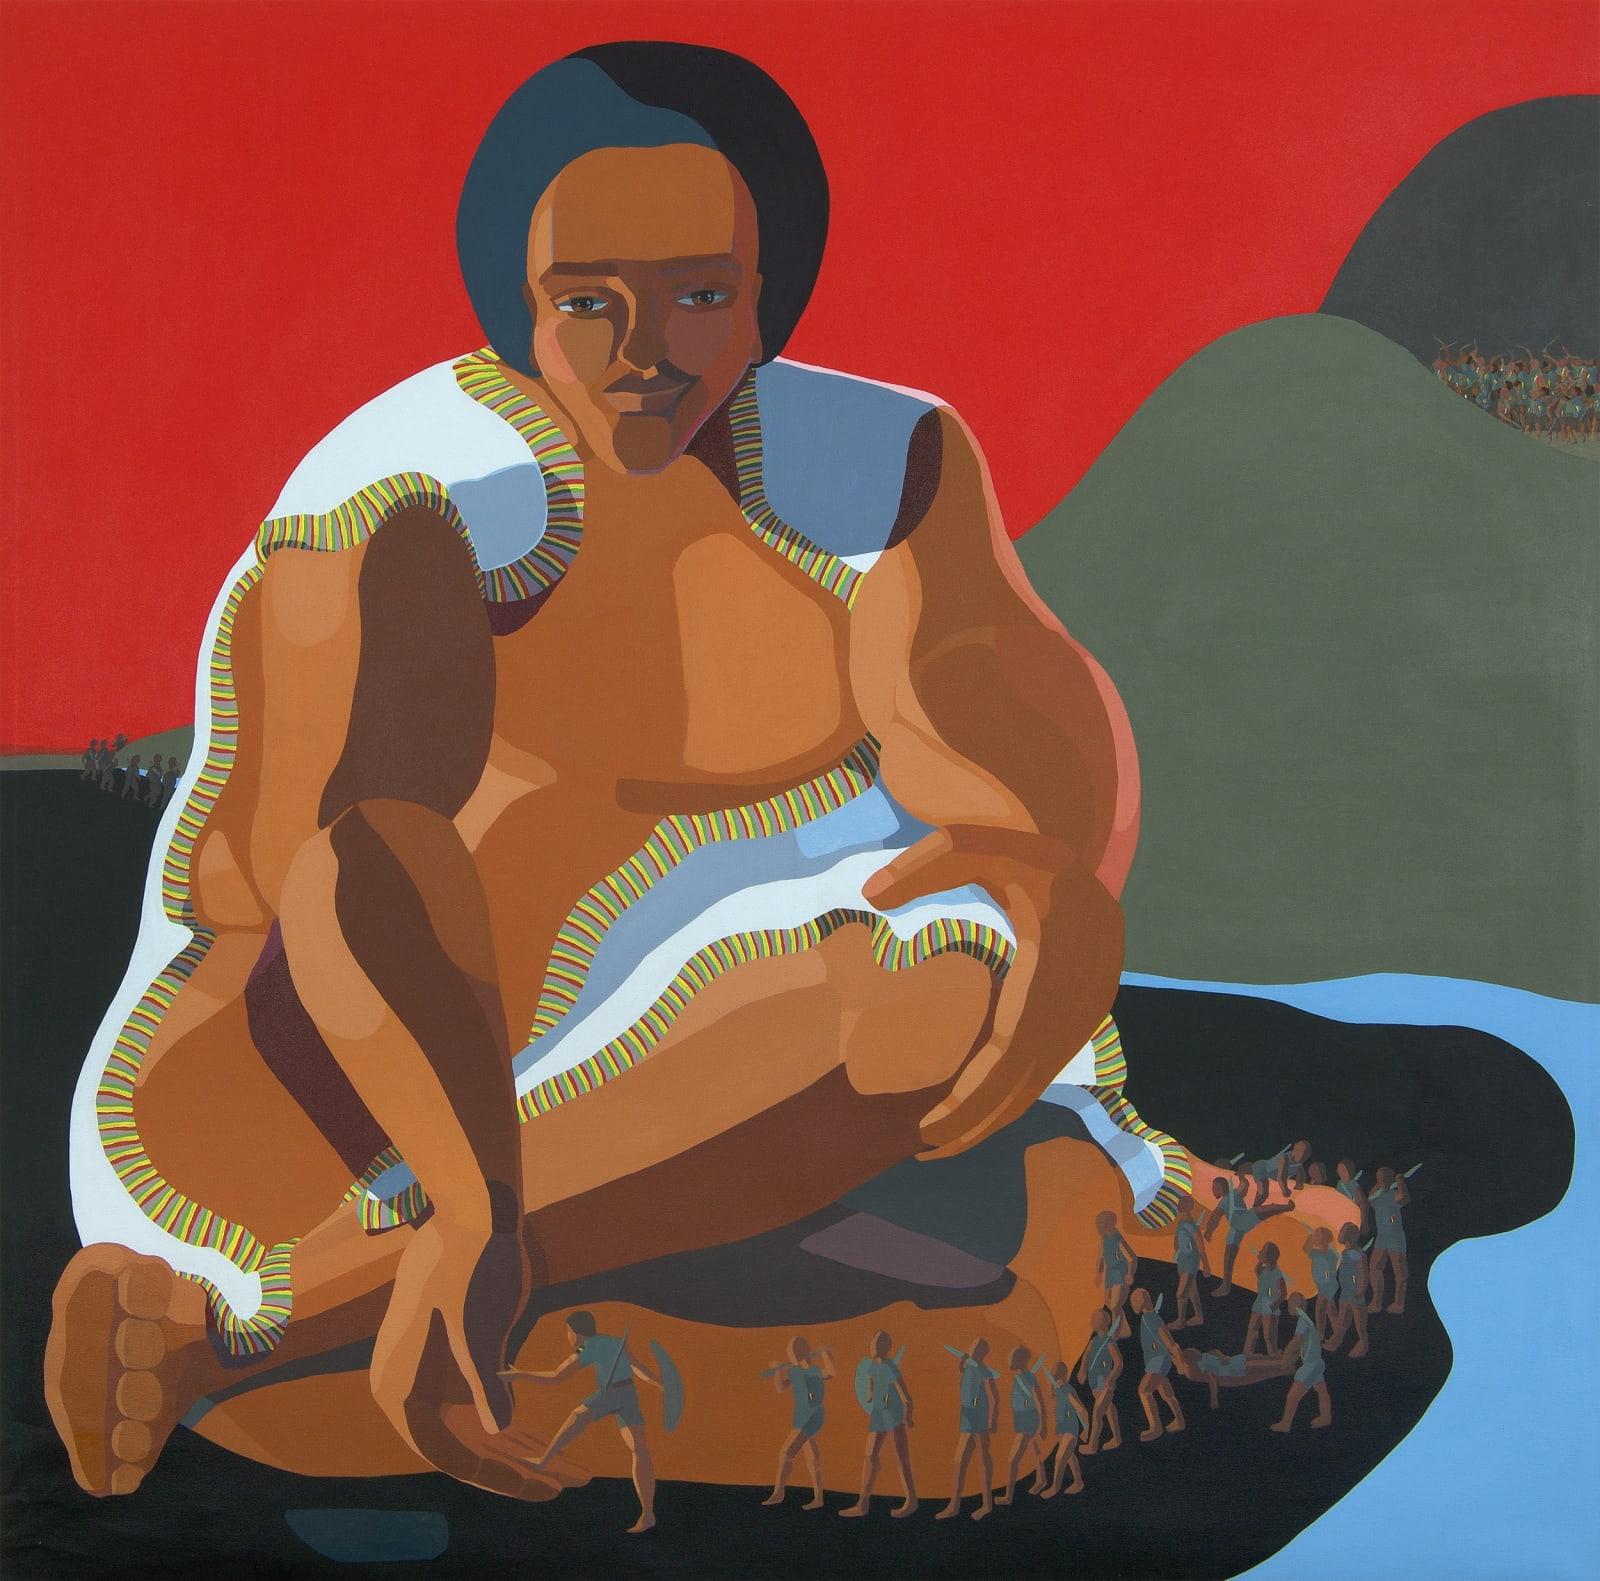 Nirit Takele, Taytu, 2018. Courtesy of the Artist and Addis Fine Art